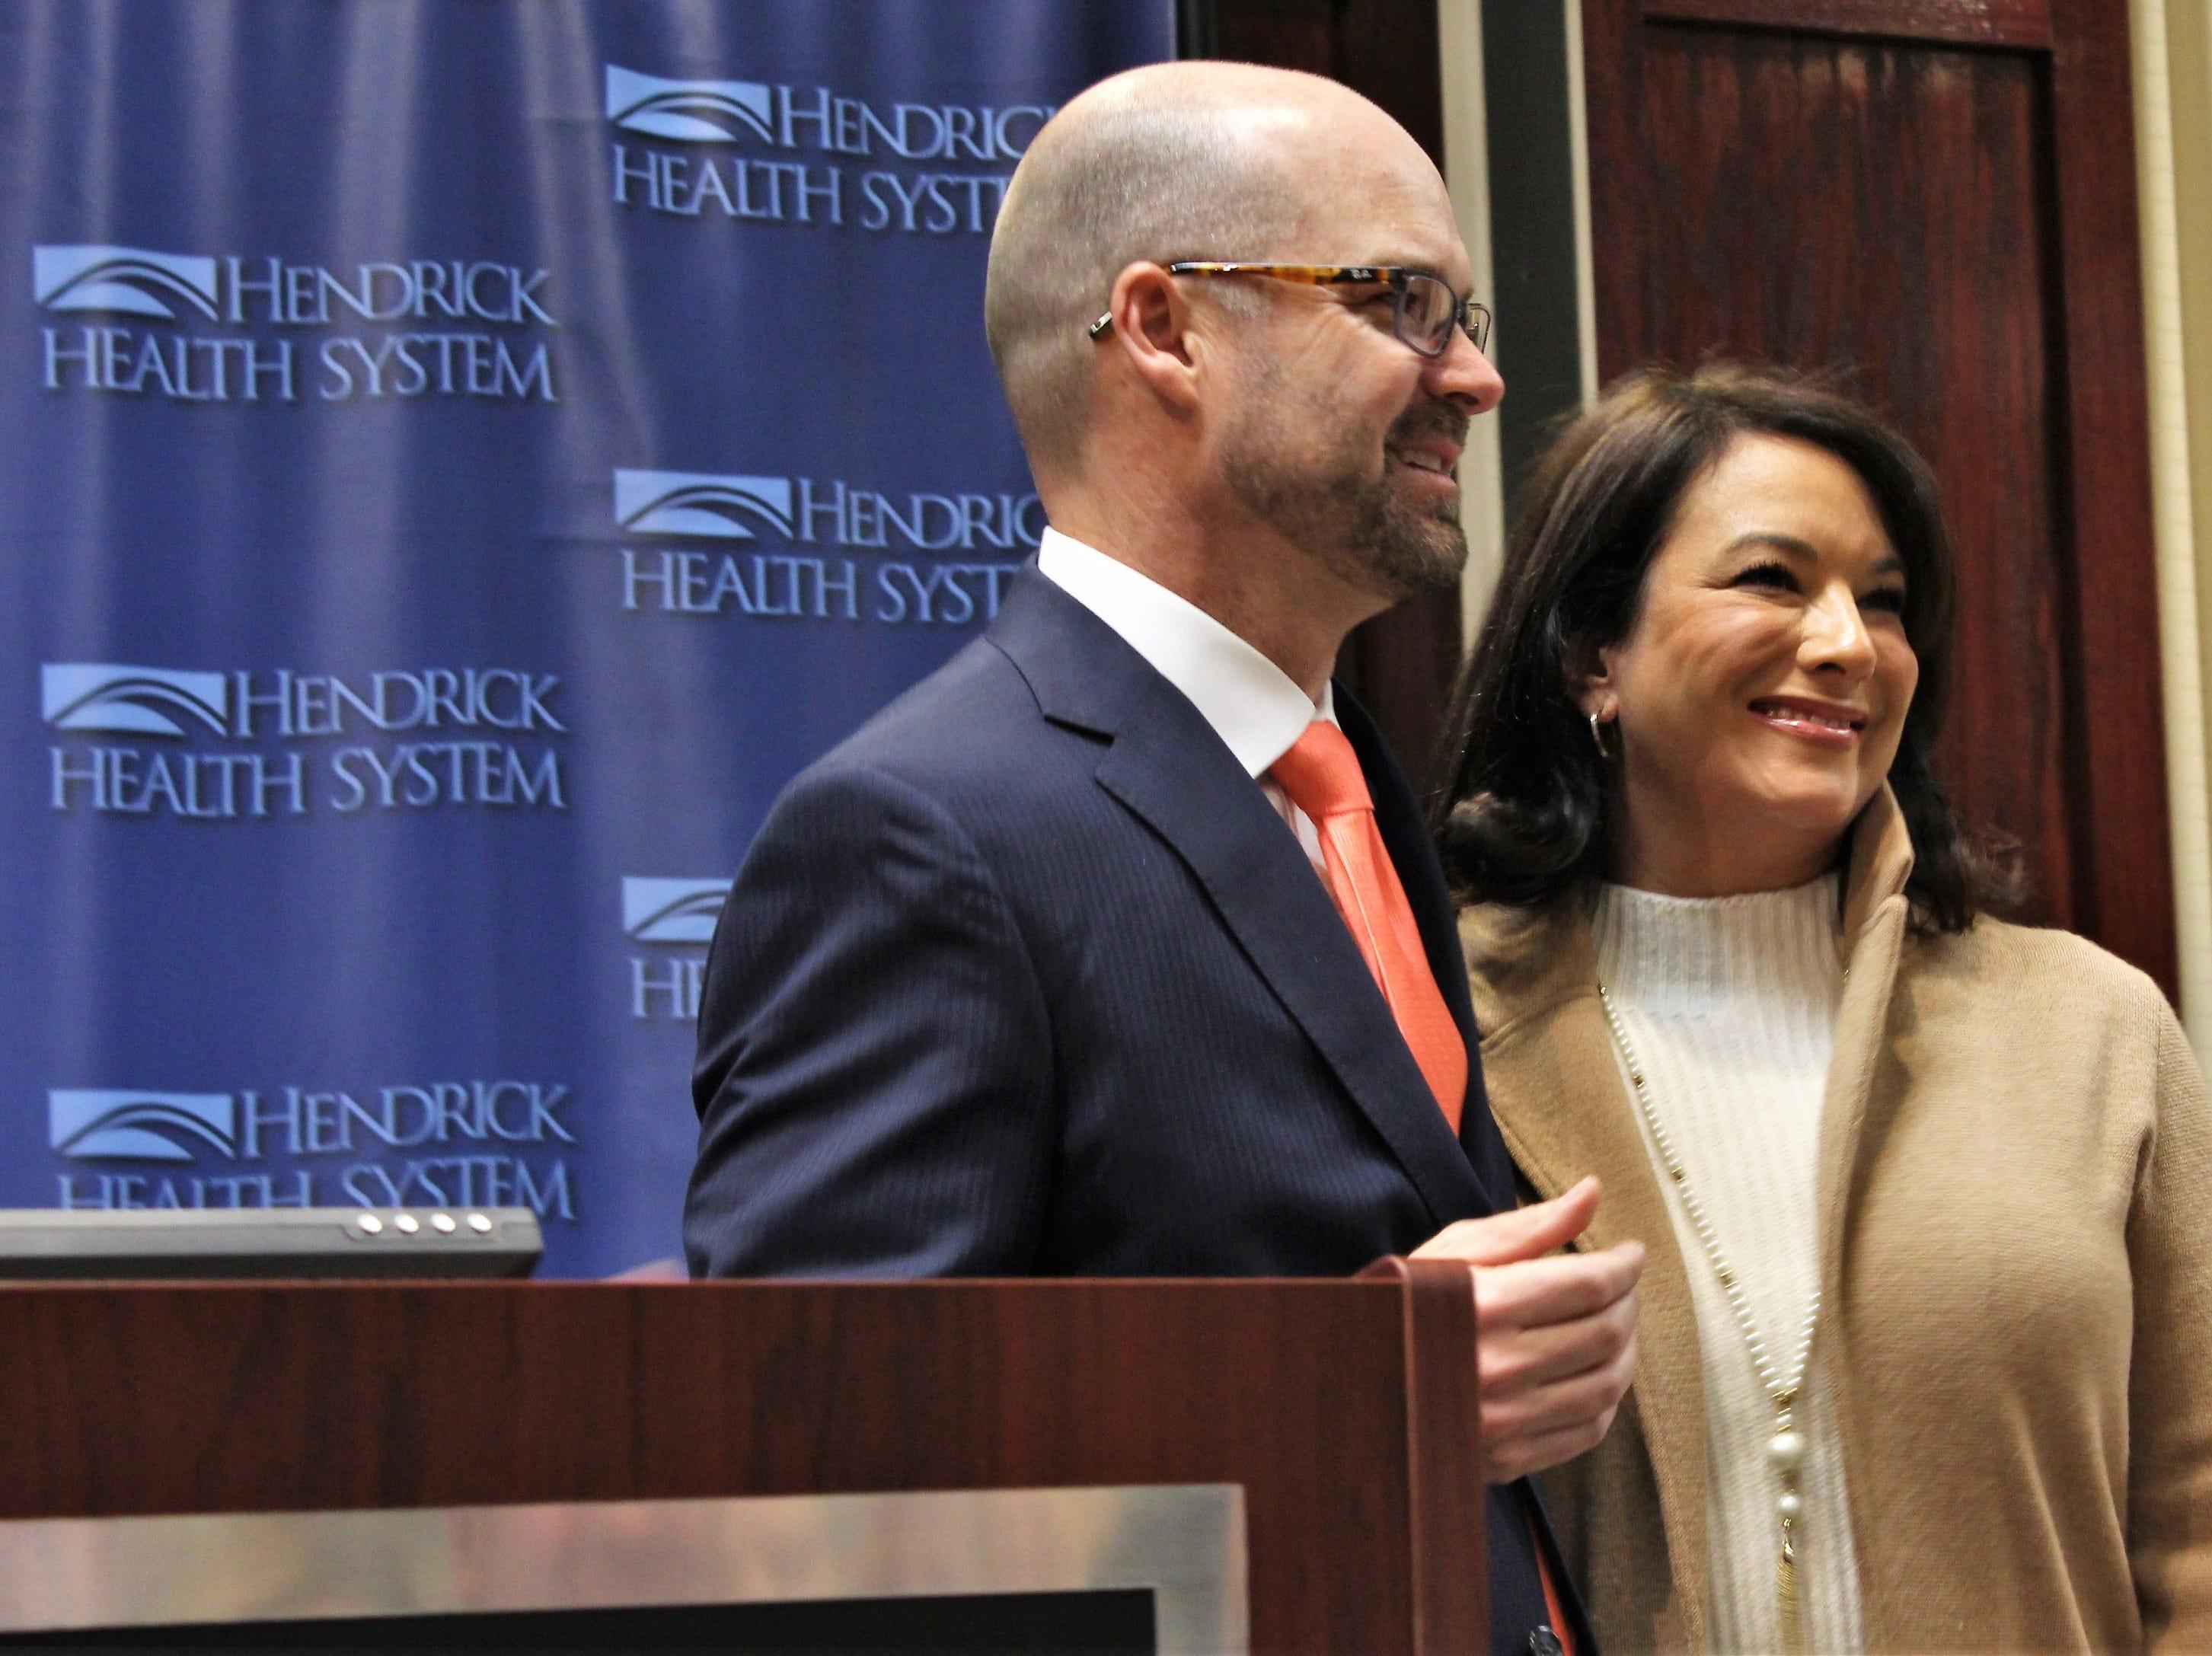 Hendrick Health System names Brad Holland president and CEO